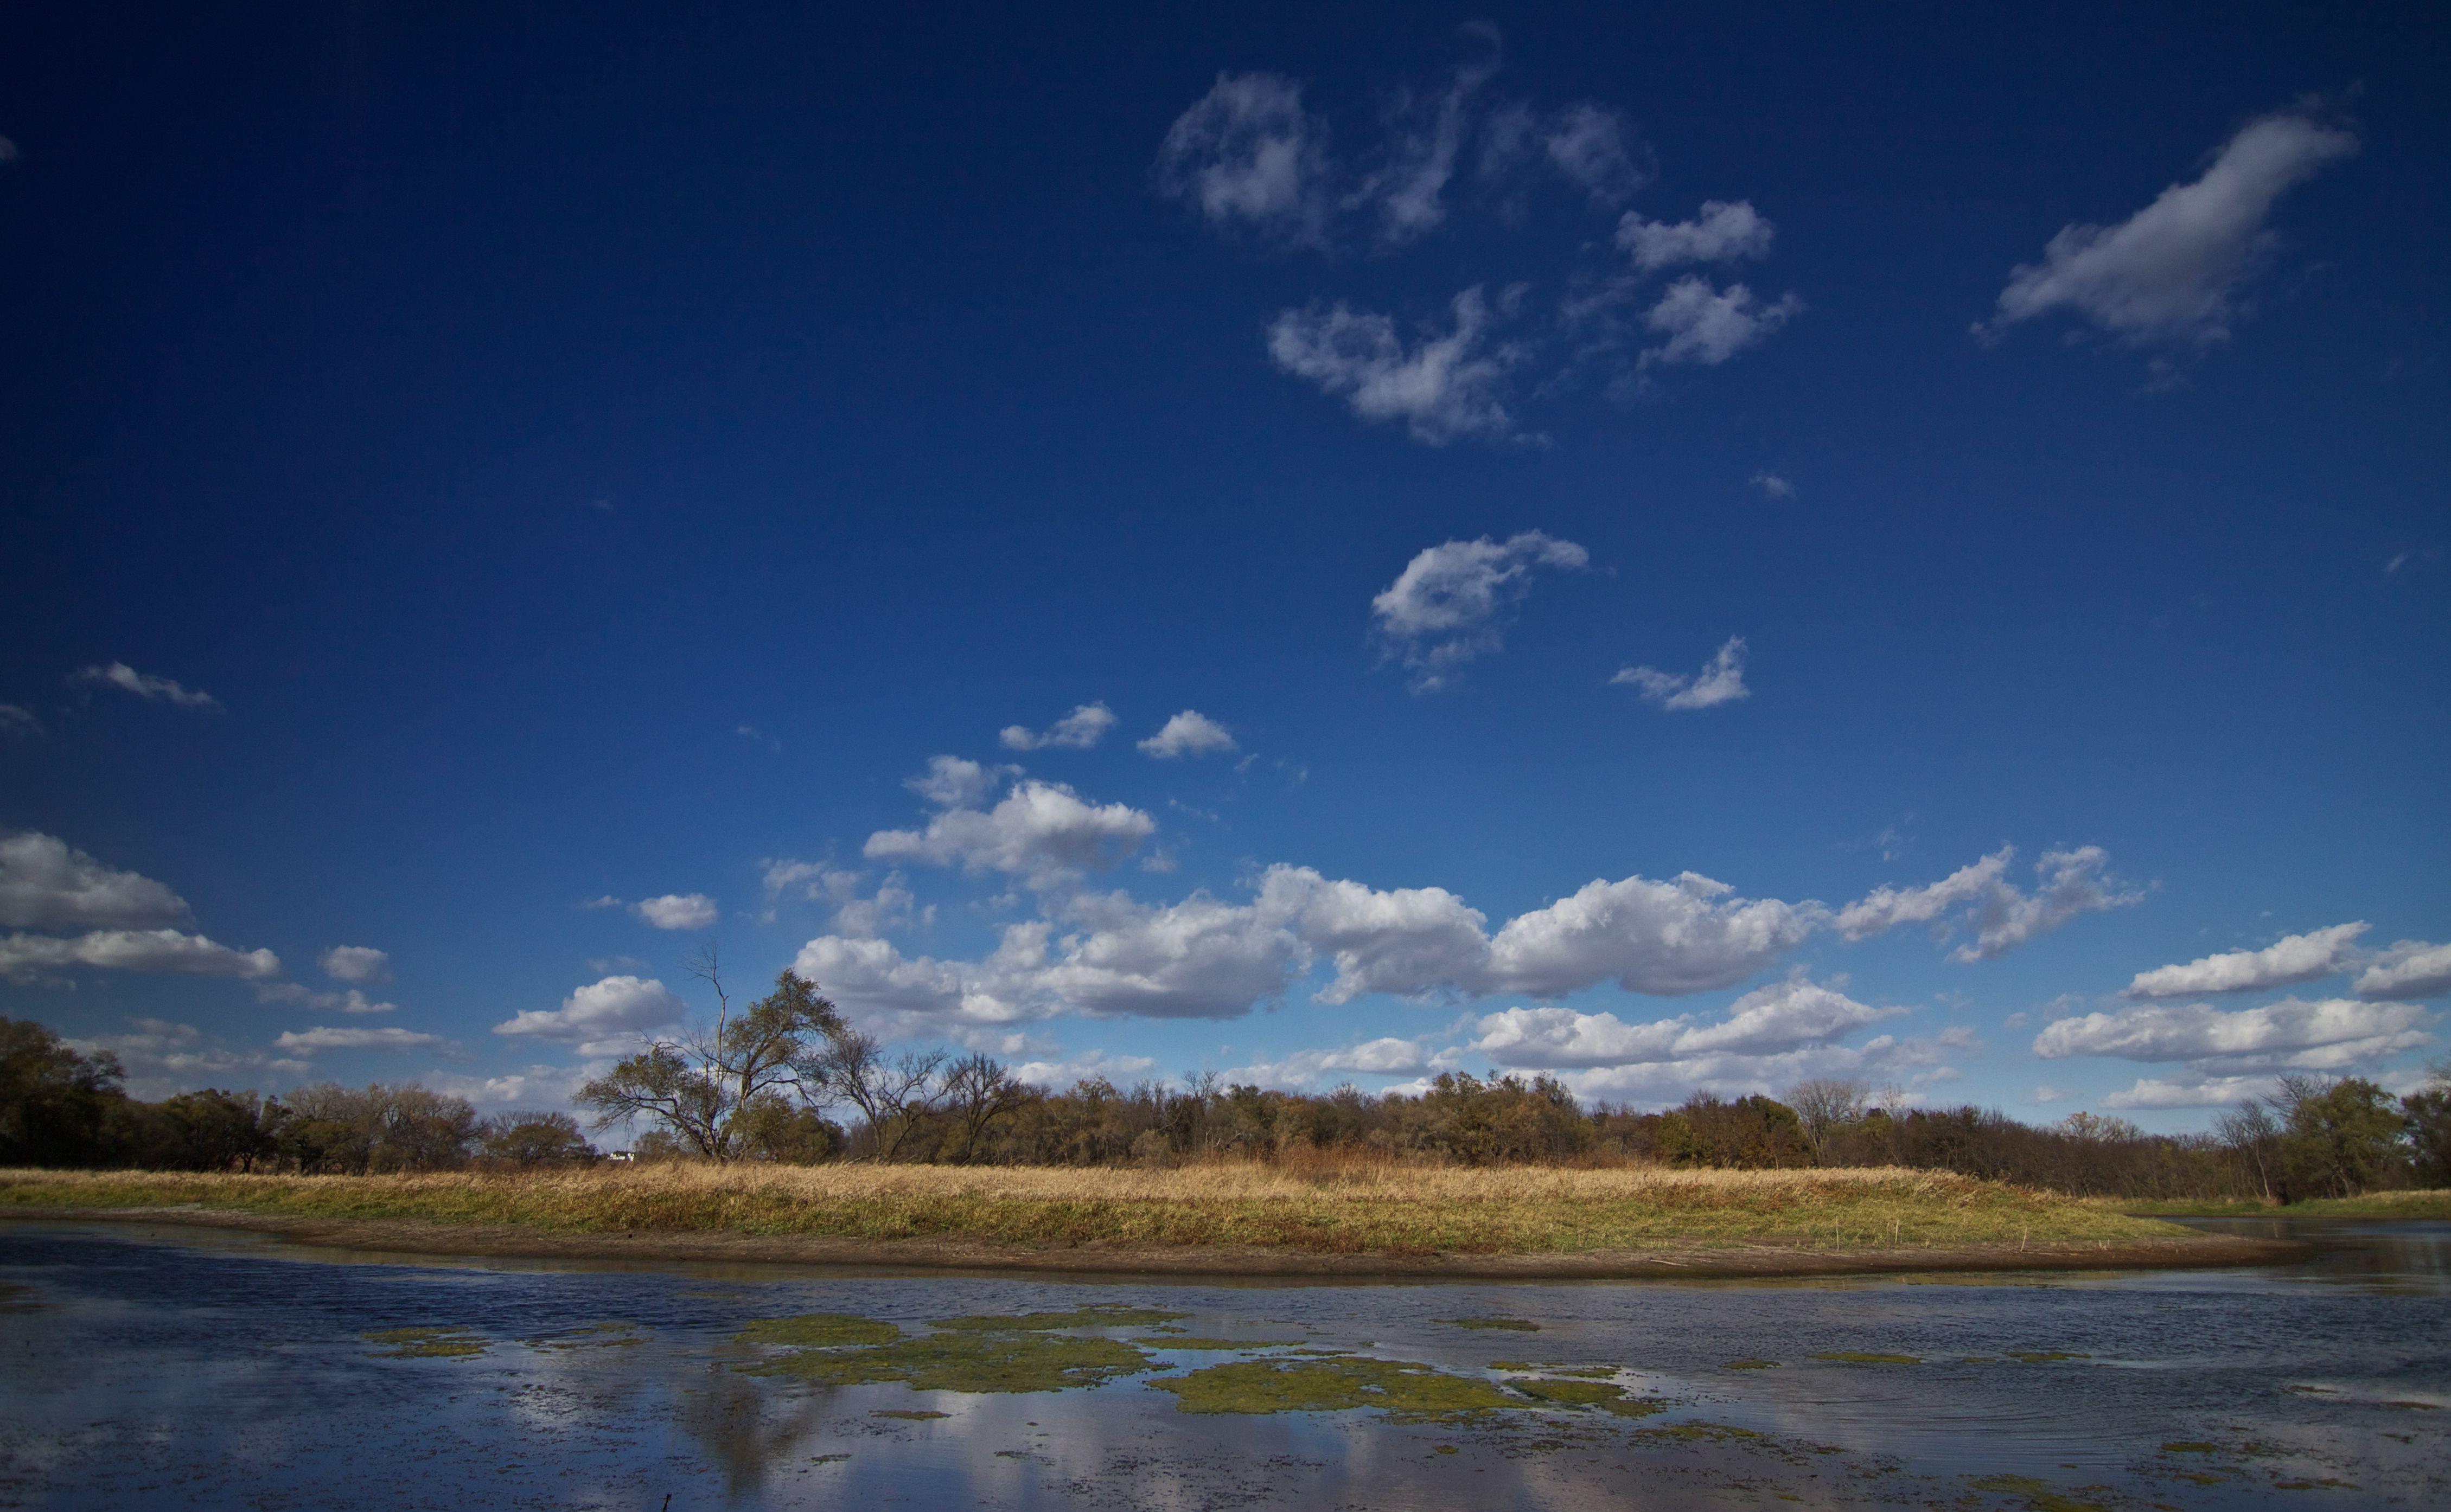 Heron Wetland photo by Adrian Olivera